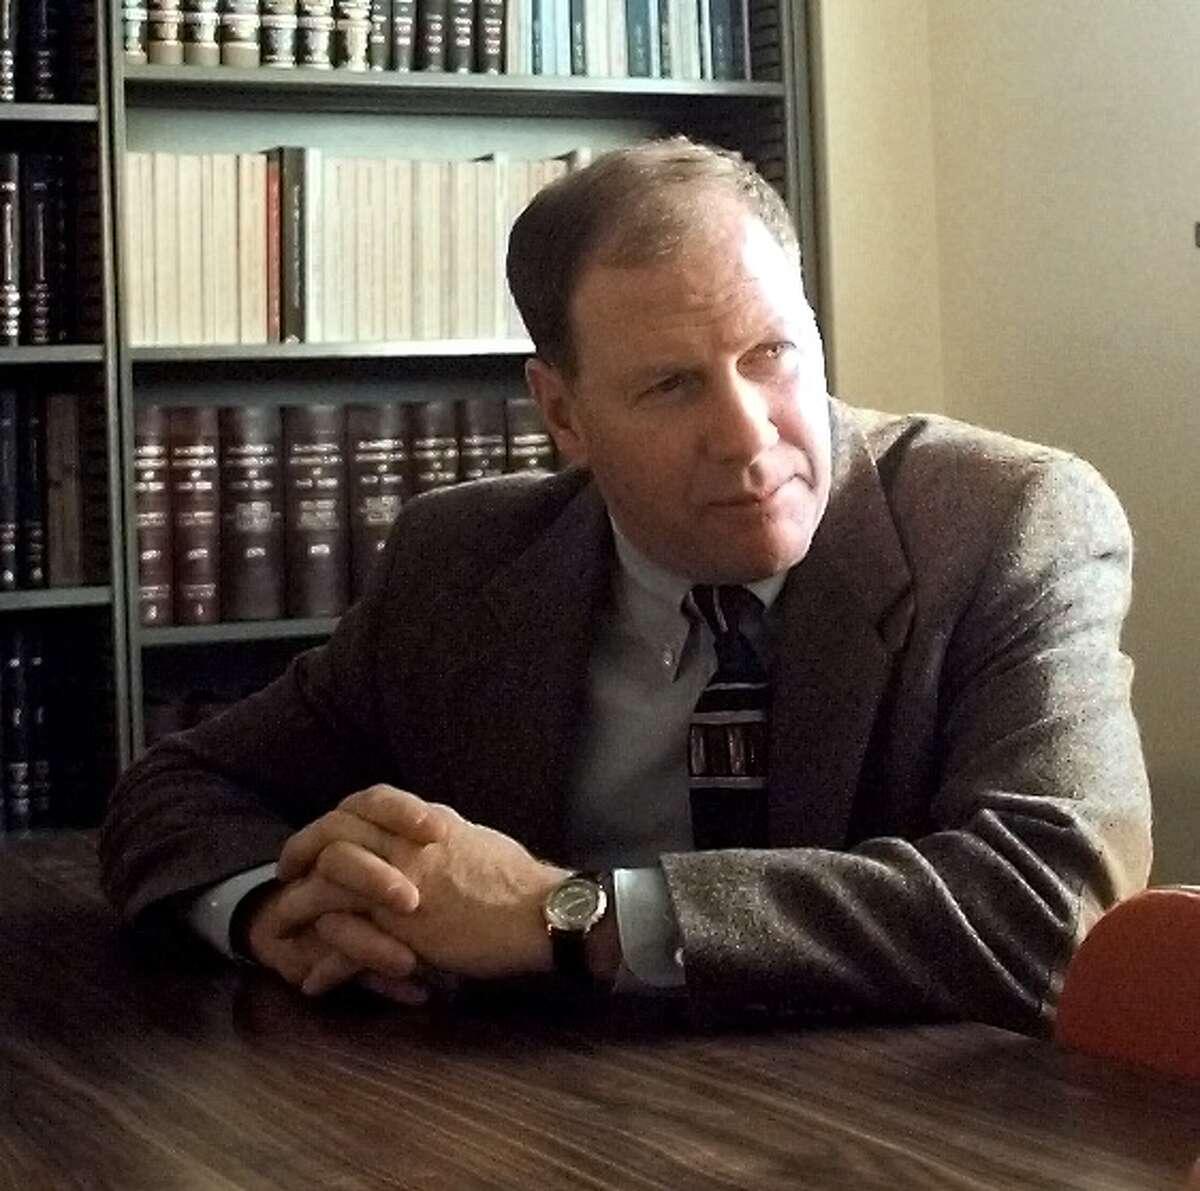 March 10, 1999 - Senior Investigator Jim Horton of Troop G, Loudonville. (Times Union photo by Paul D. Kniskern, Sr.)